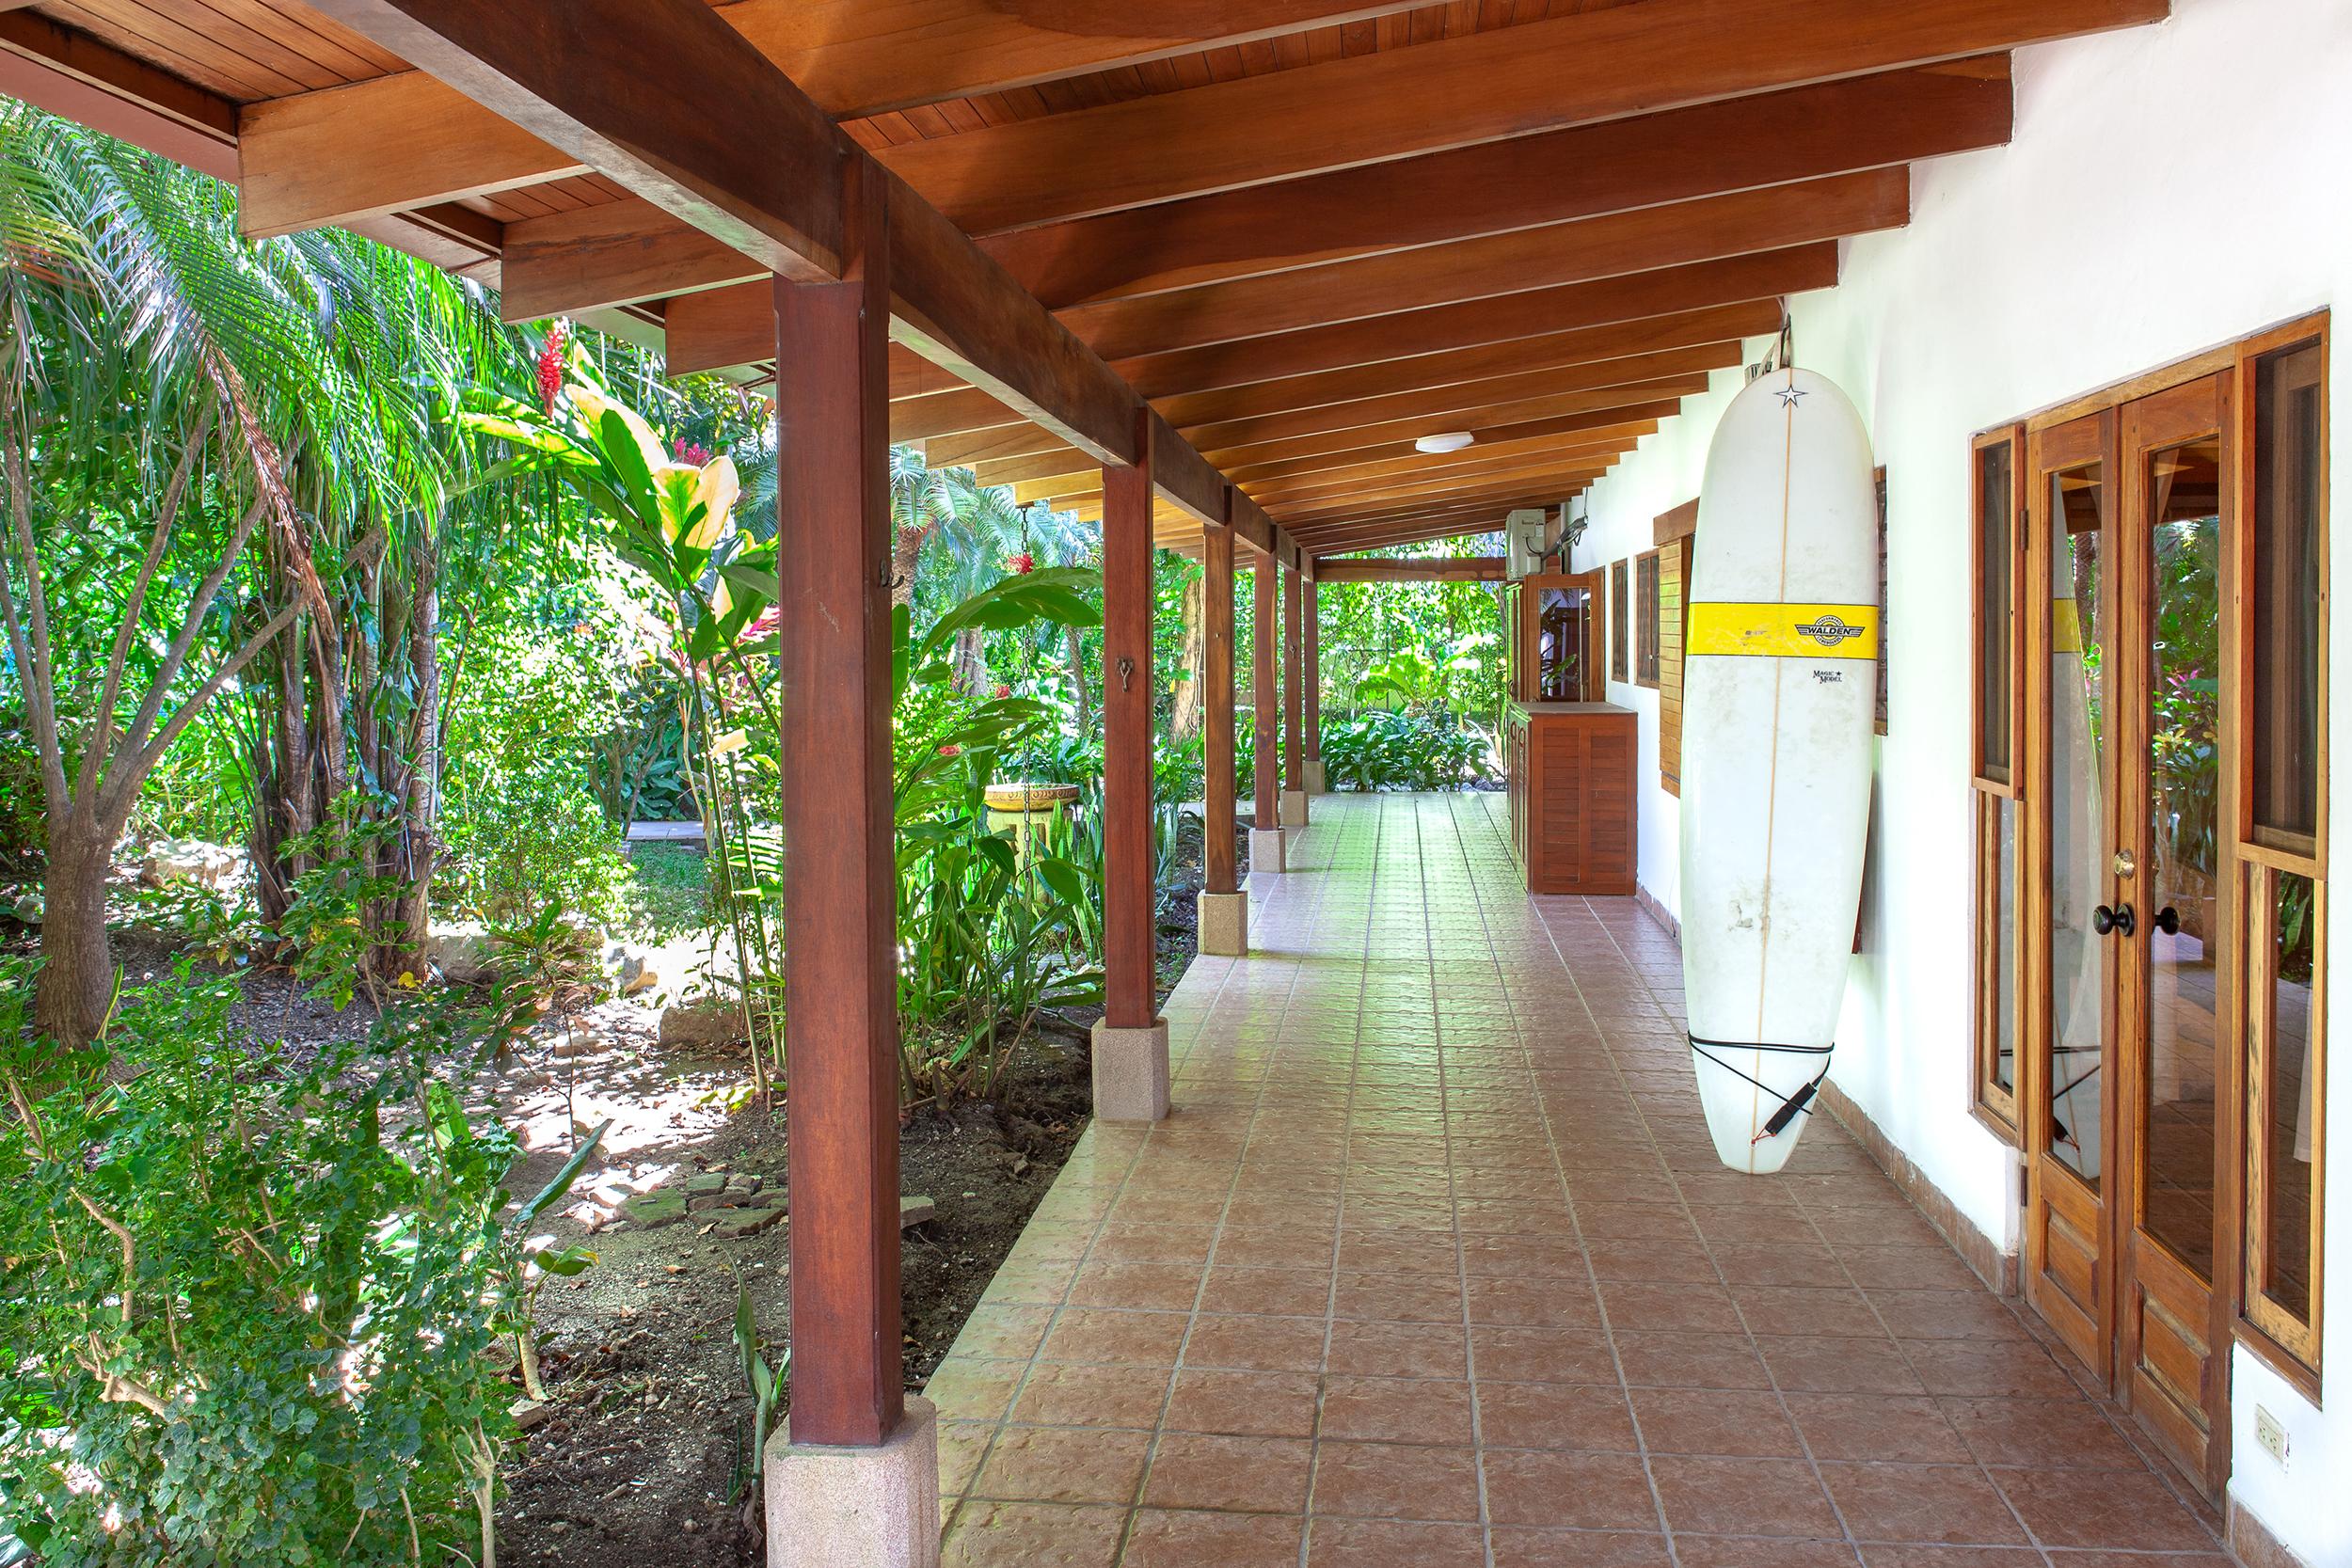 LOW - Casa las Brisas -  Jardines005.jpg